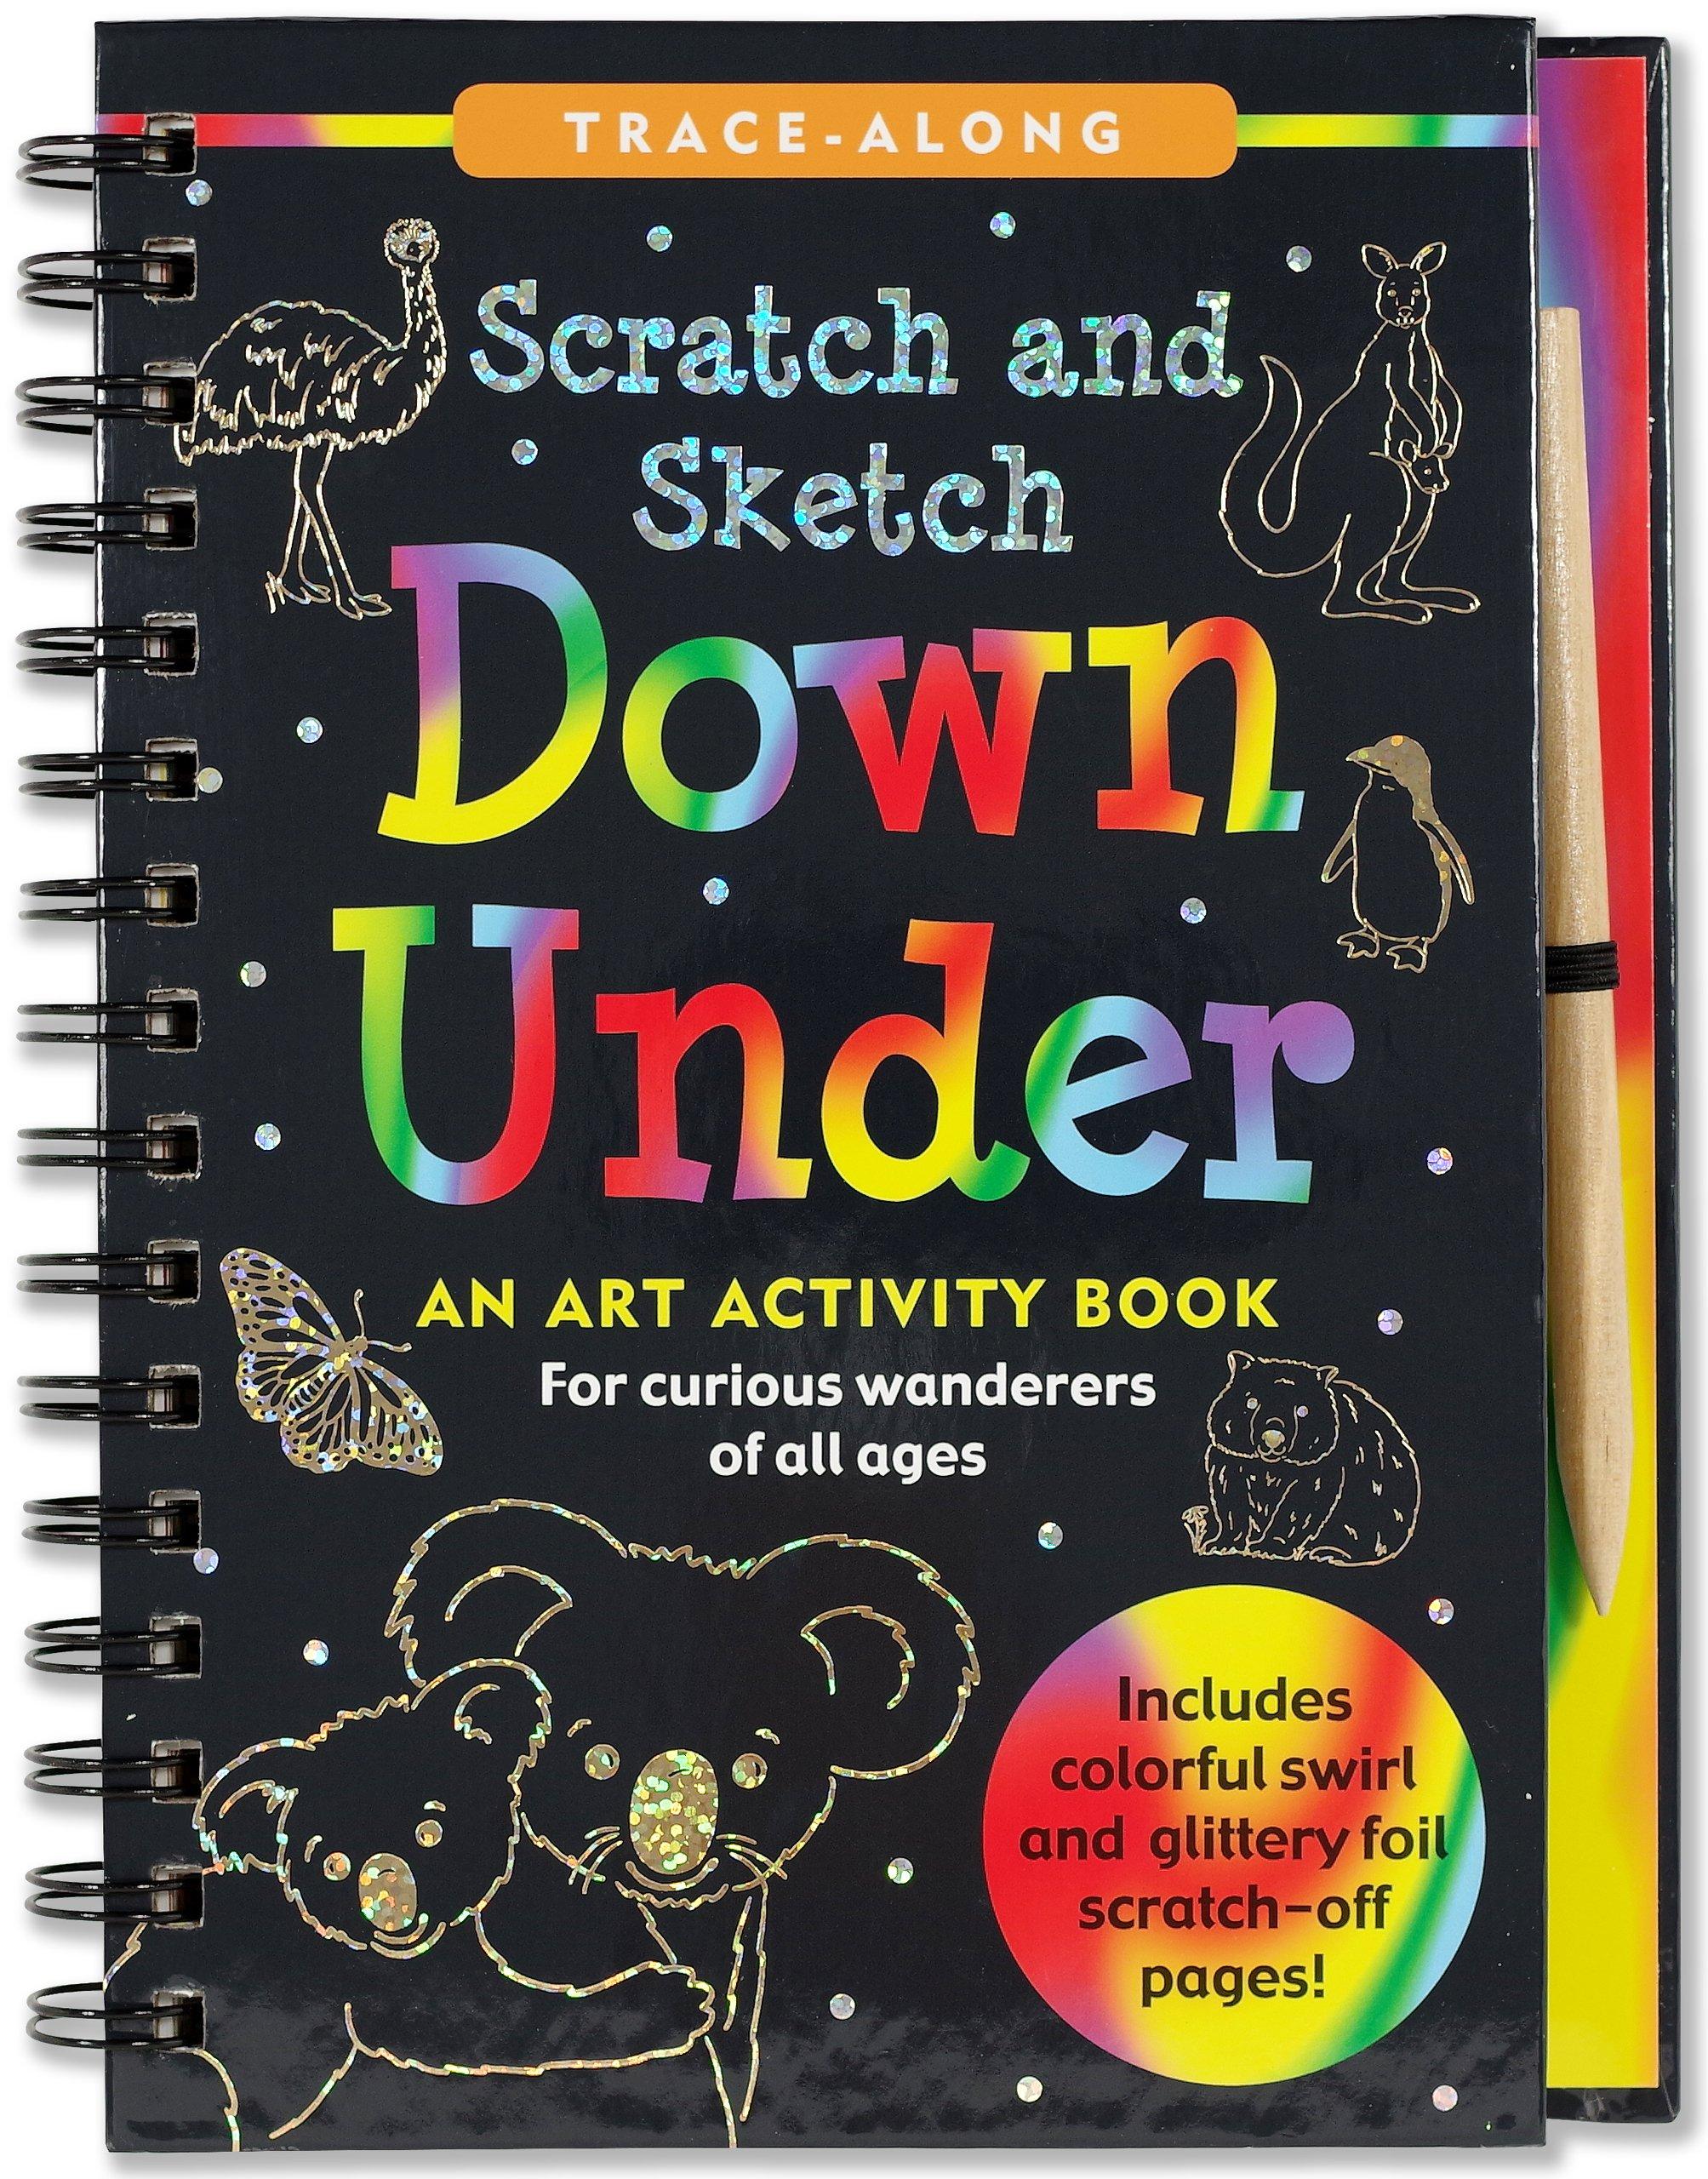 Scratch & Sketch Down Under (Trace Along)